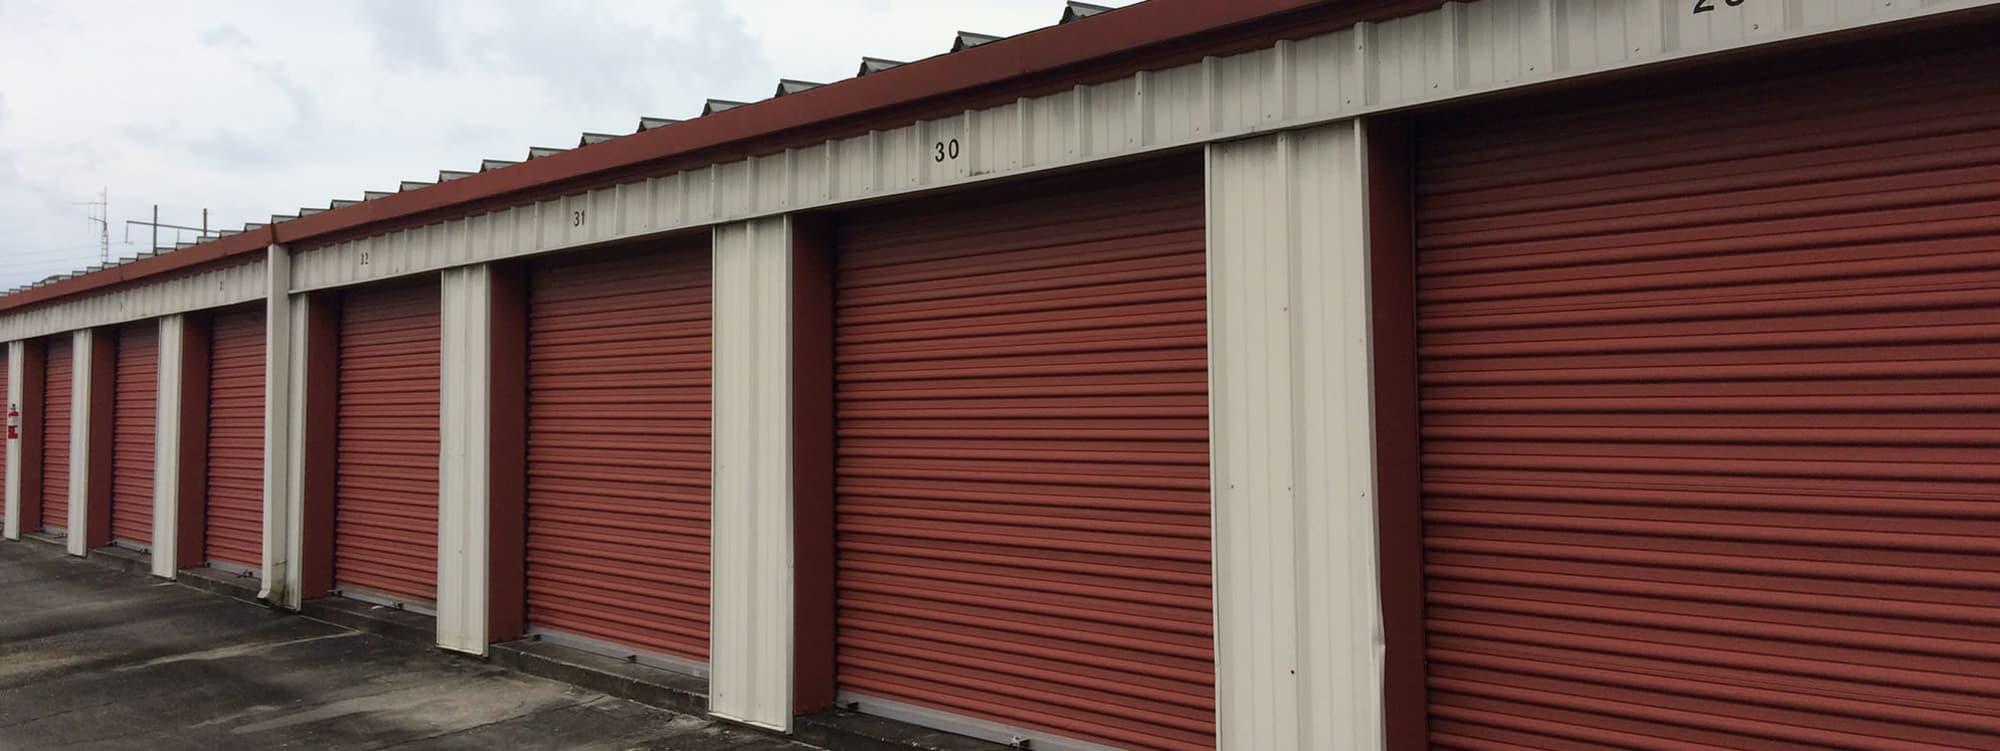 Panama City Fl Self Storage In Parker Usa Storage Centers